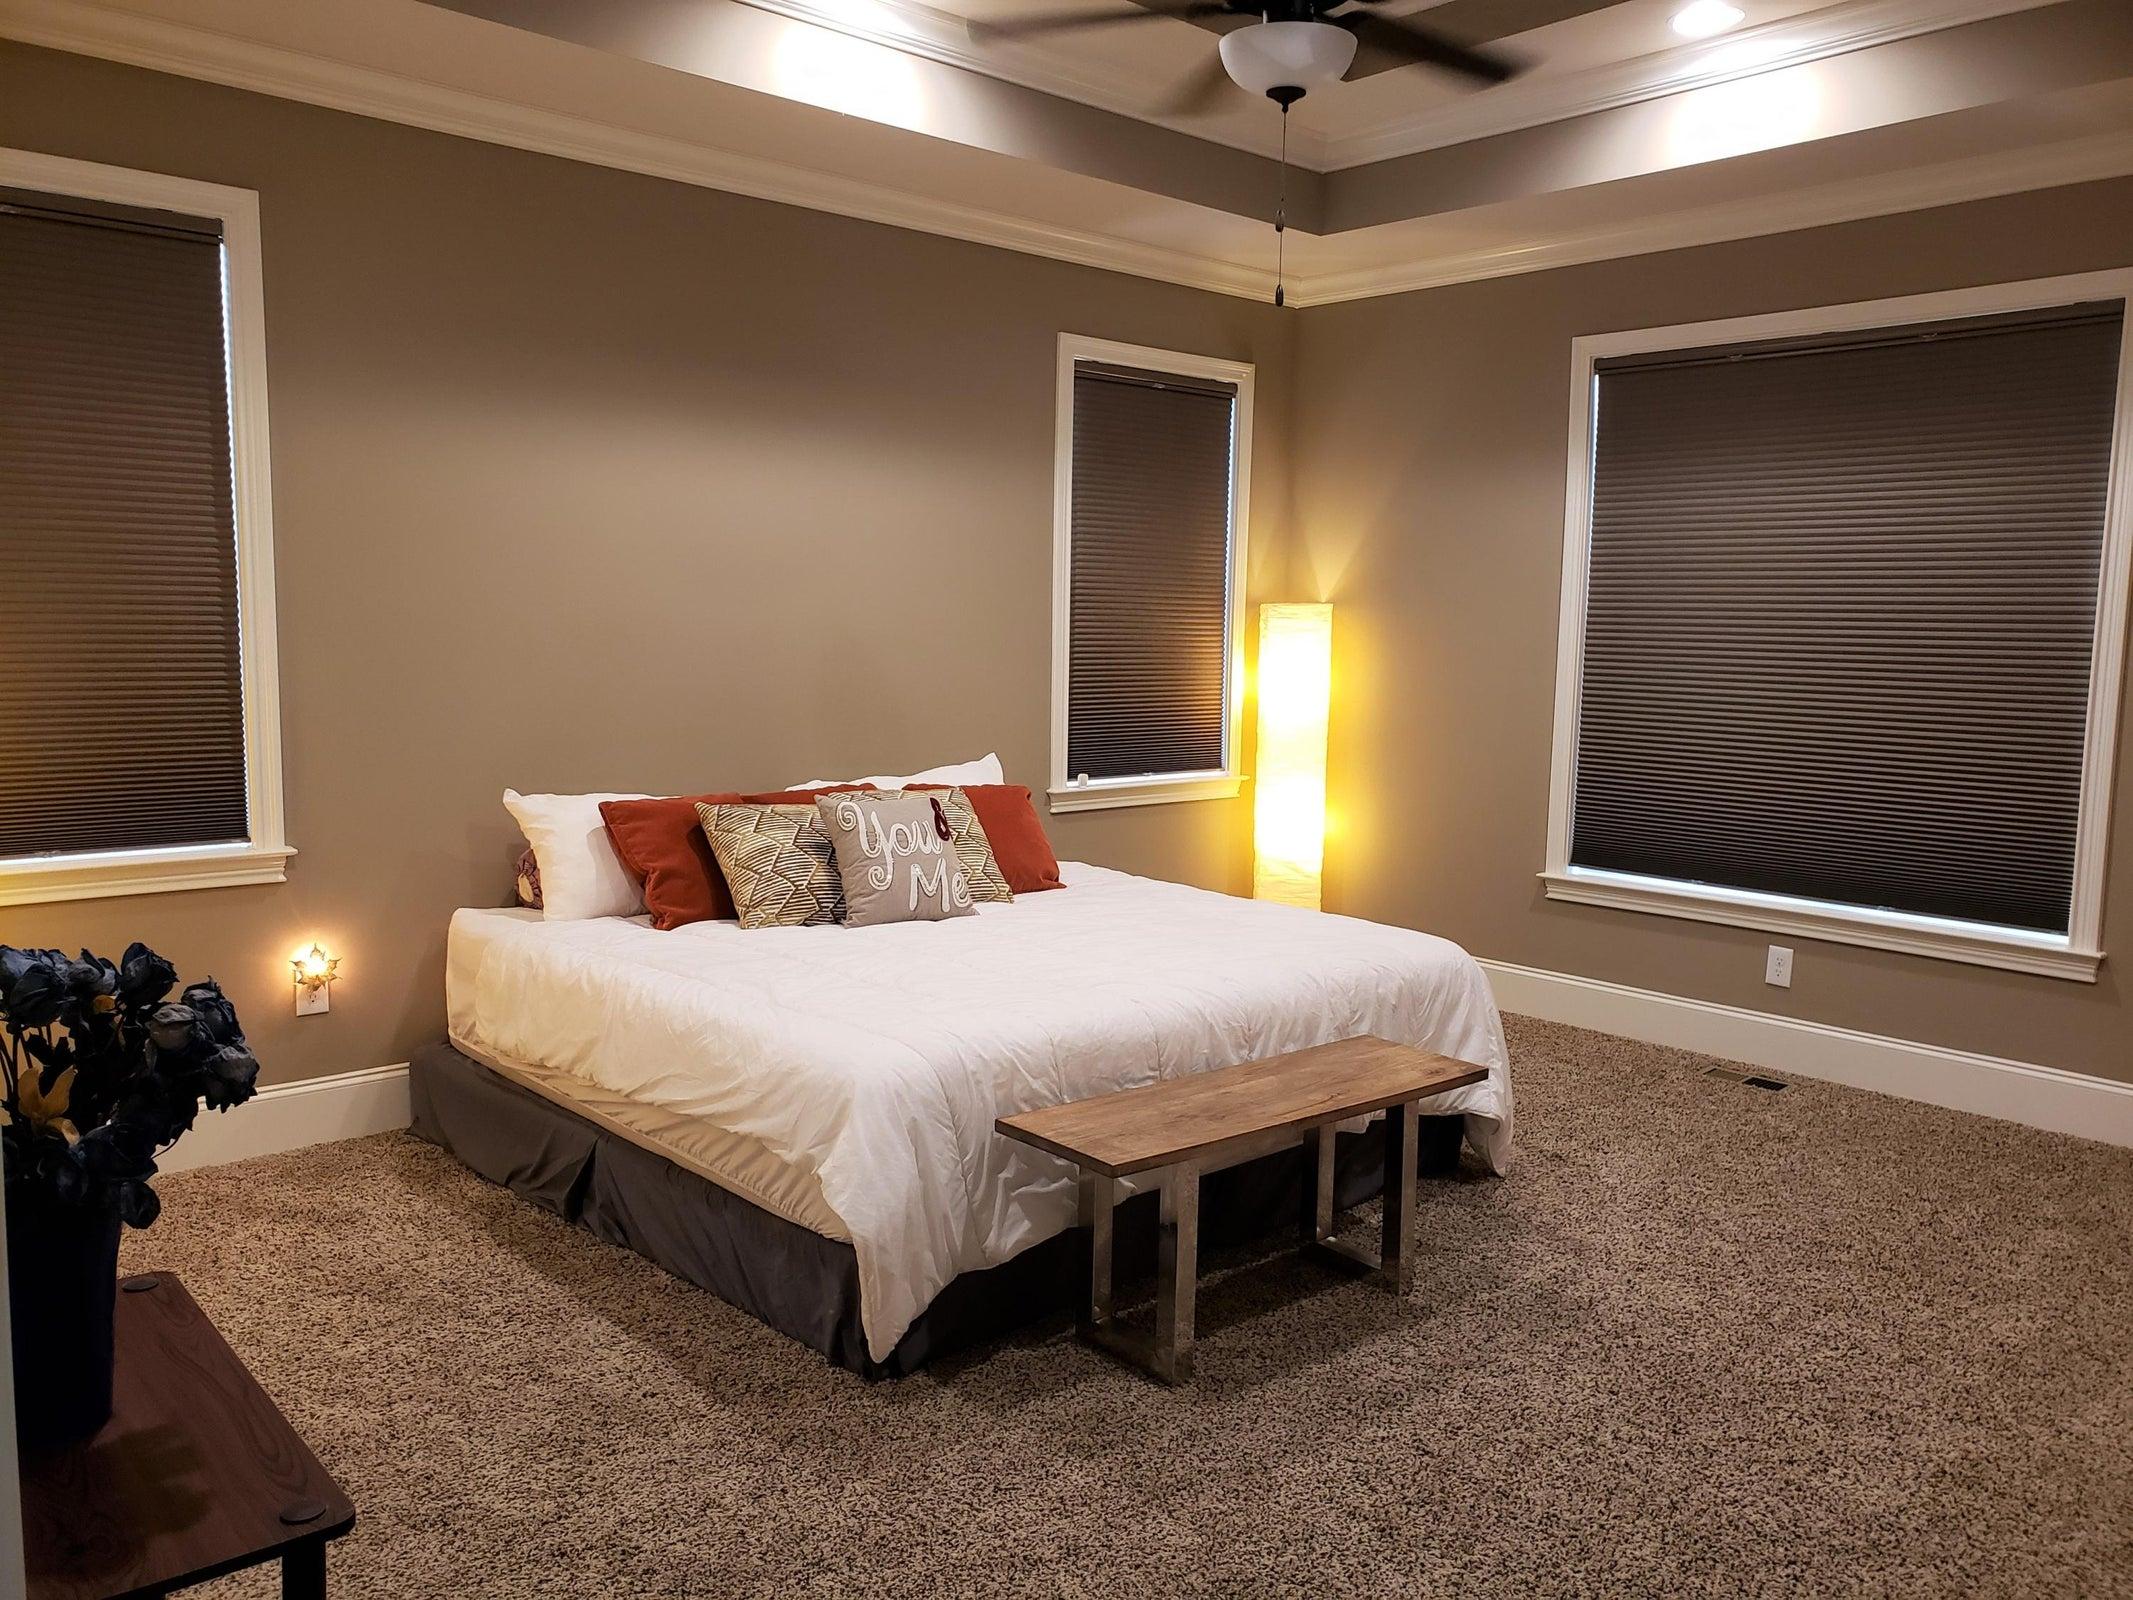 wendy siman - 8 master bedroom